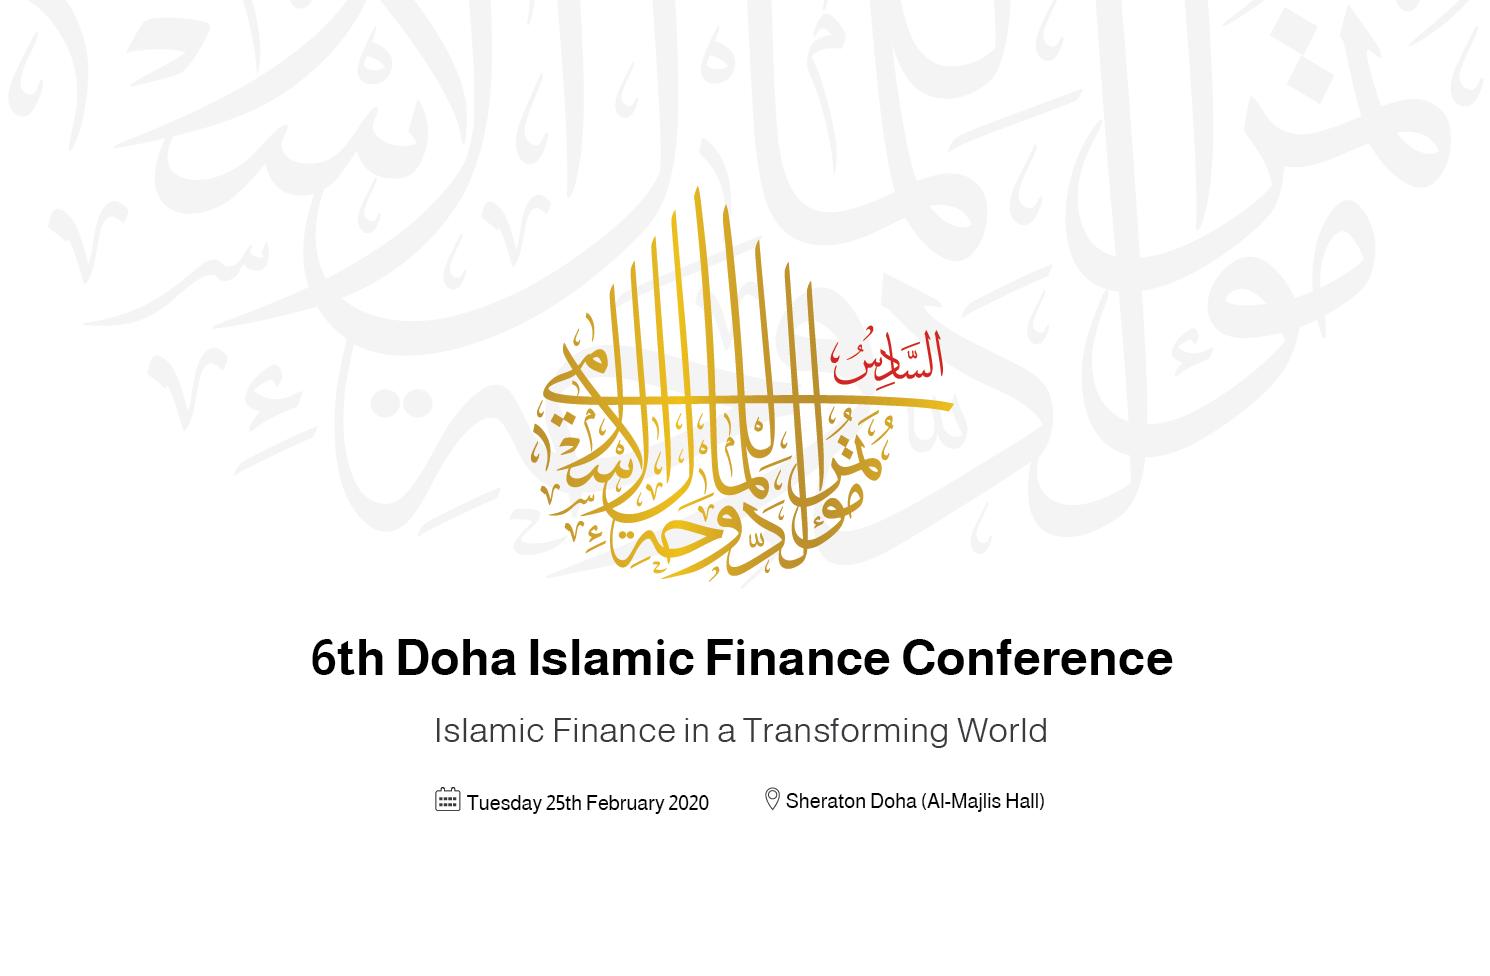 Sixth Doha Islamic Finance Conference